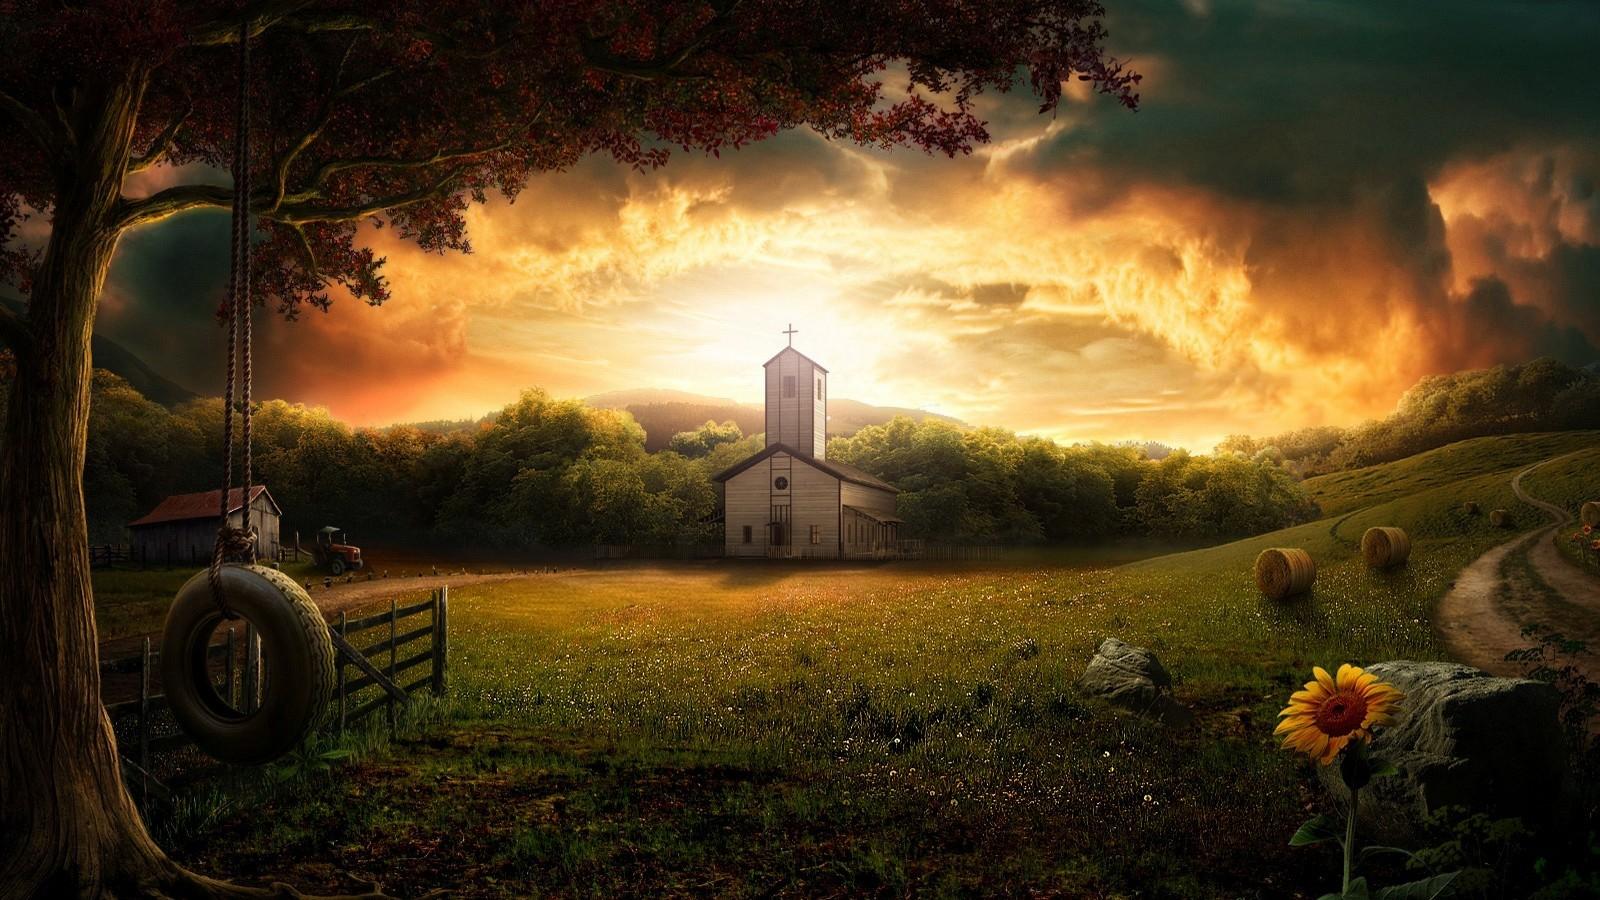 Best Nature Scene HD Wallpaper